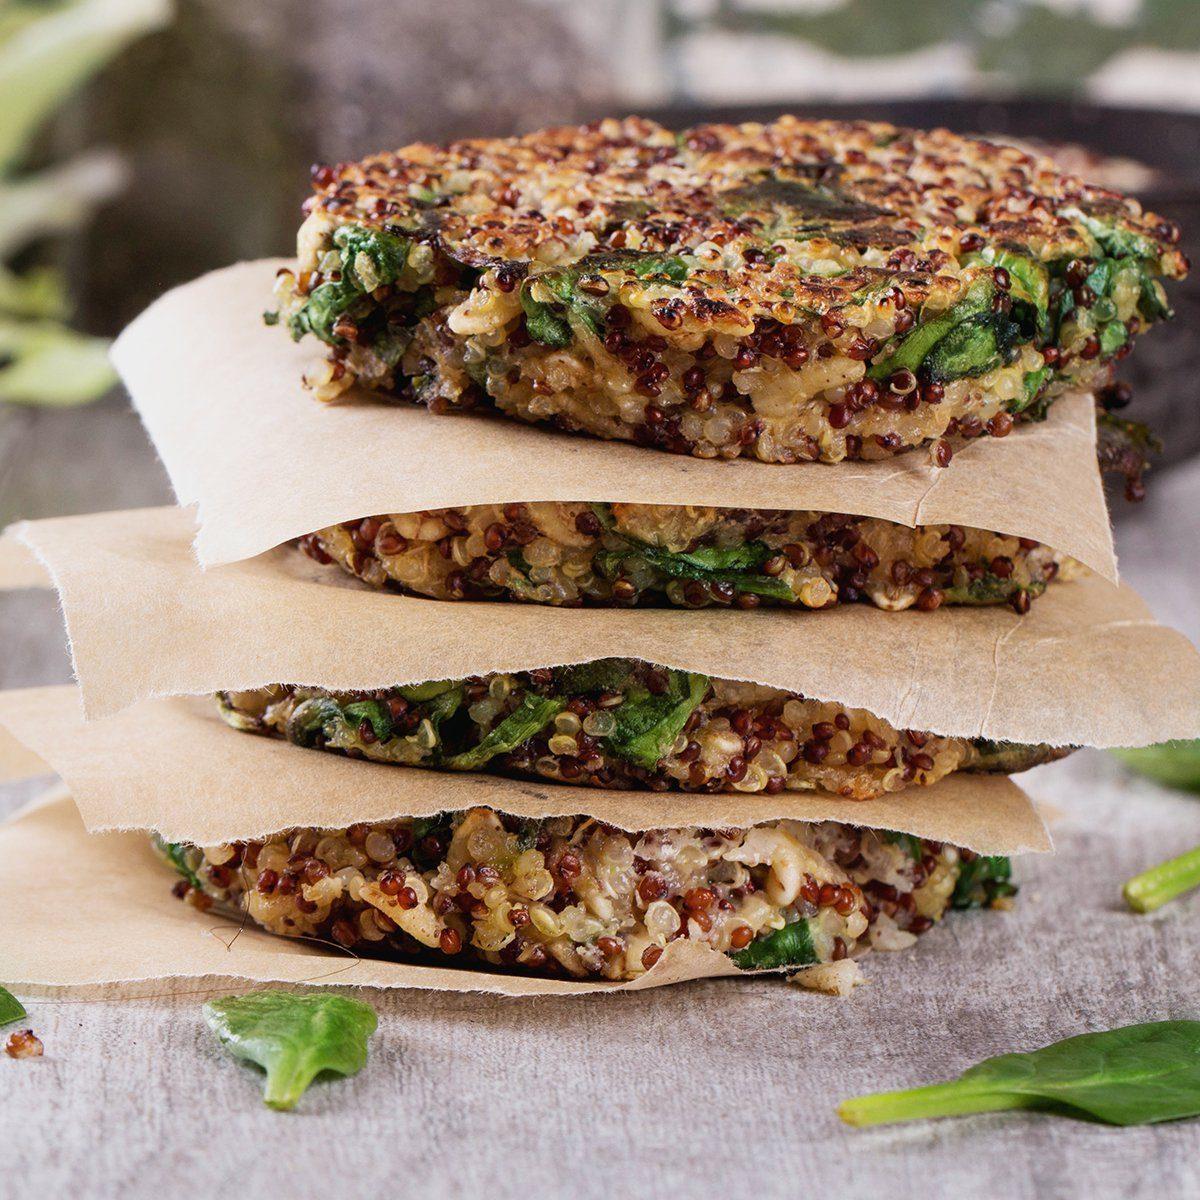 Veggie quinoa burgers with lettuce, tomato and spinach